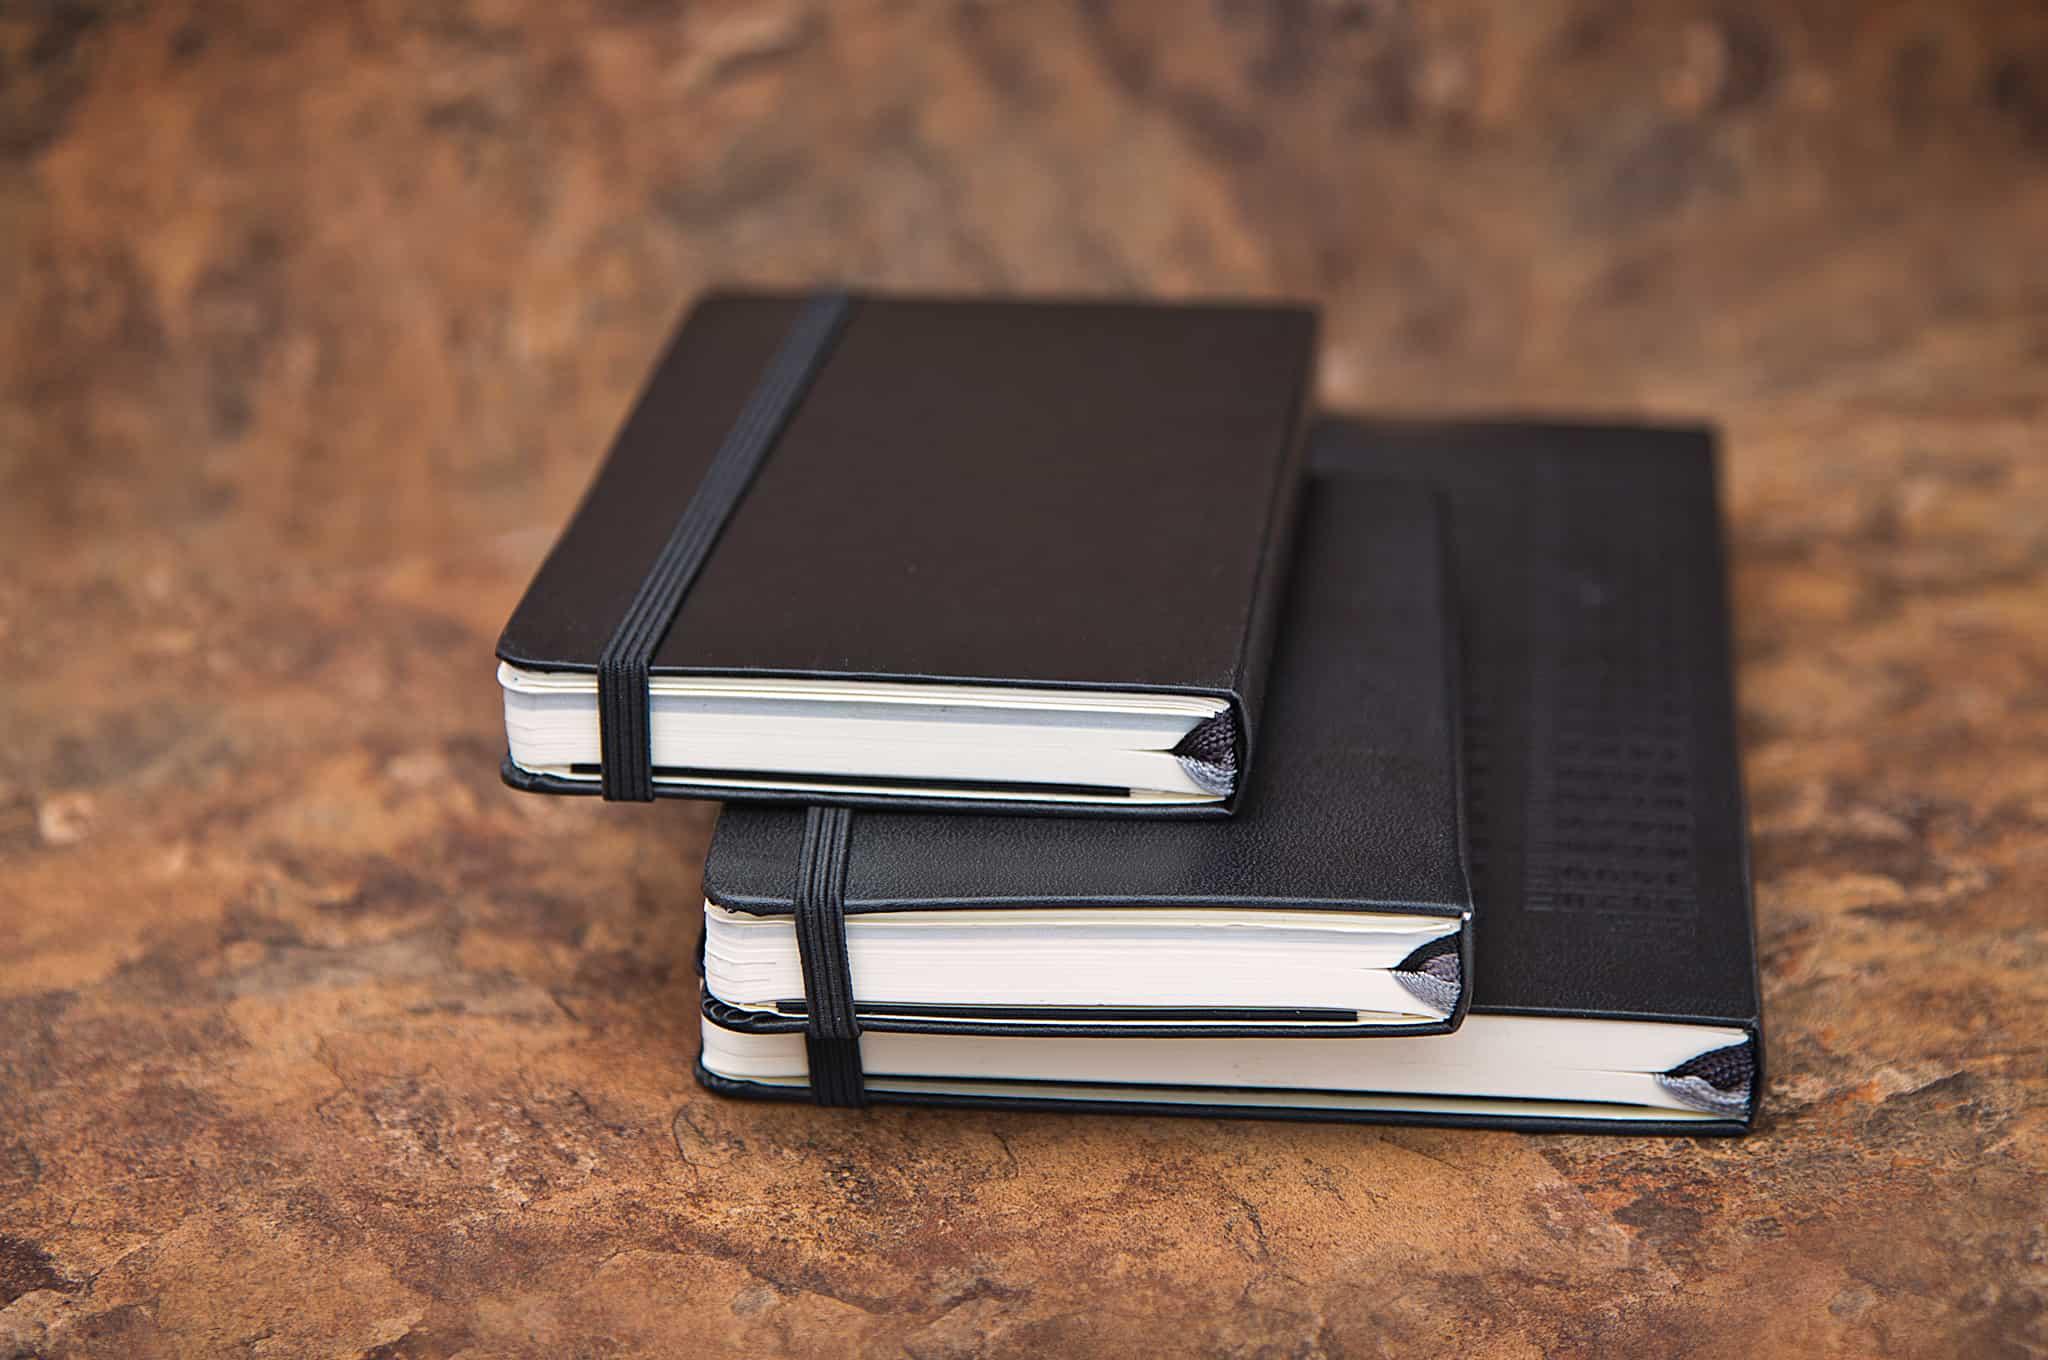 Moleskine Classic – edc notebook